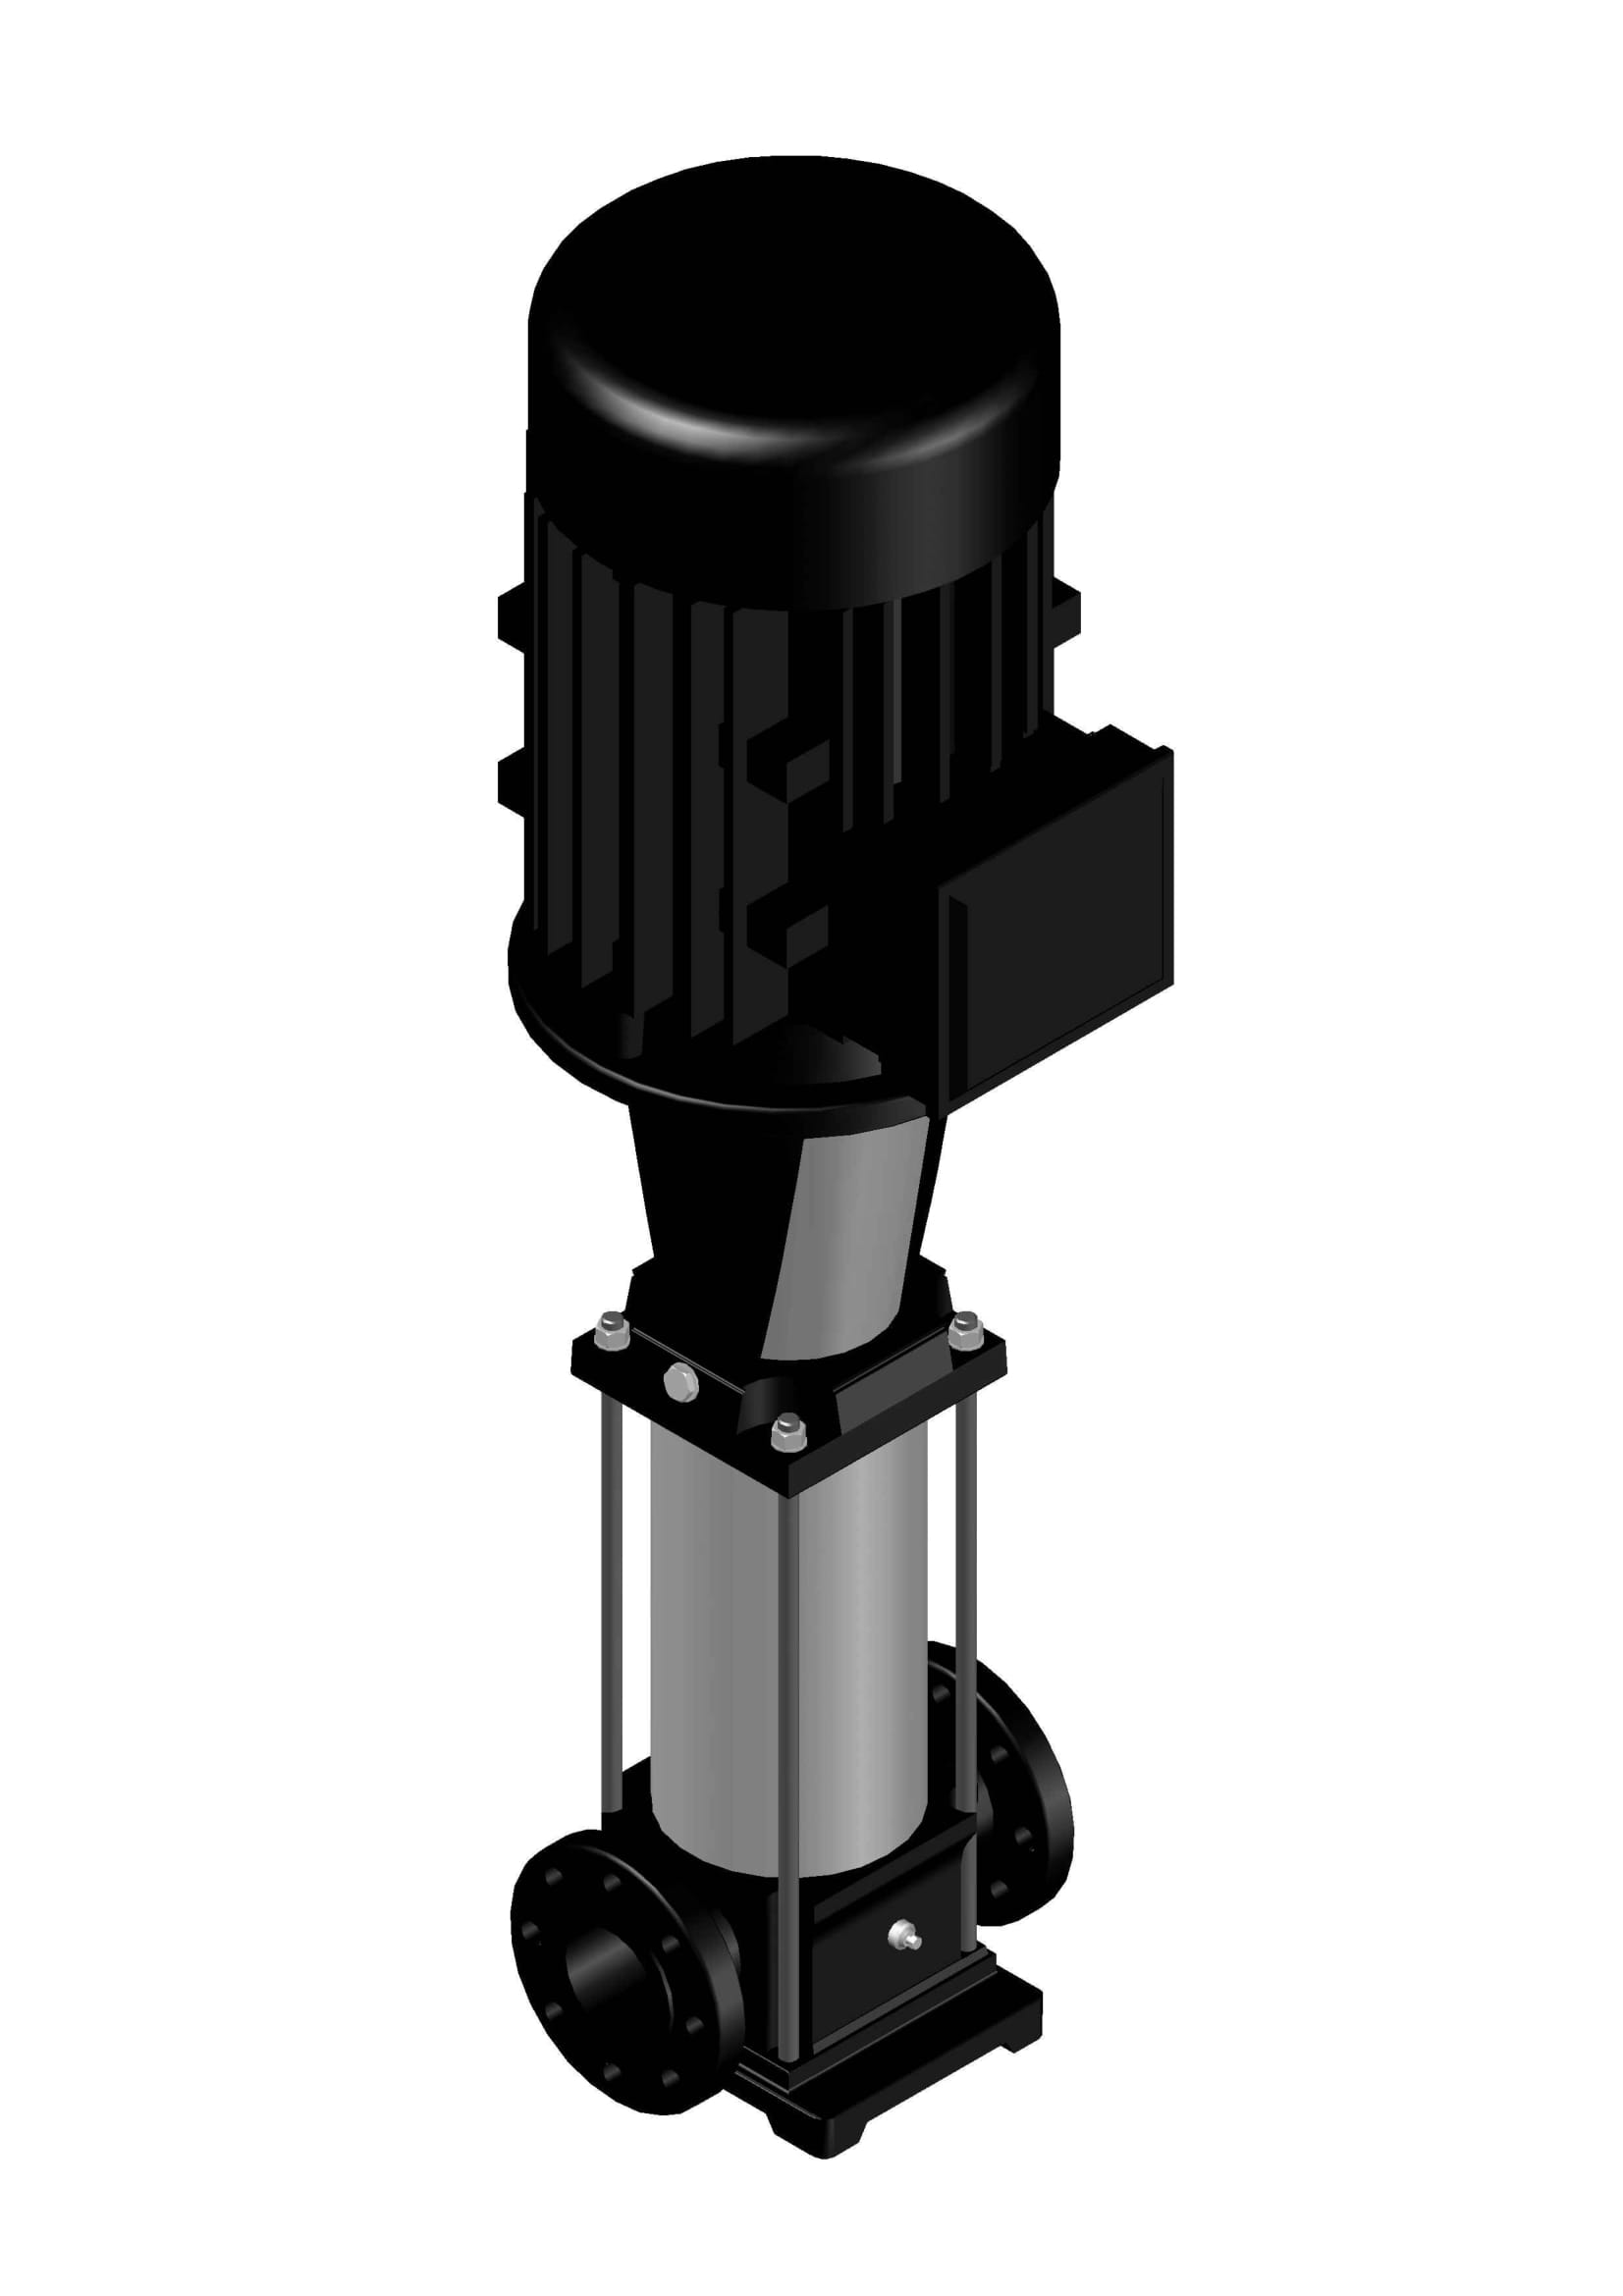 BV 64-05